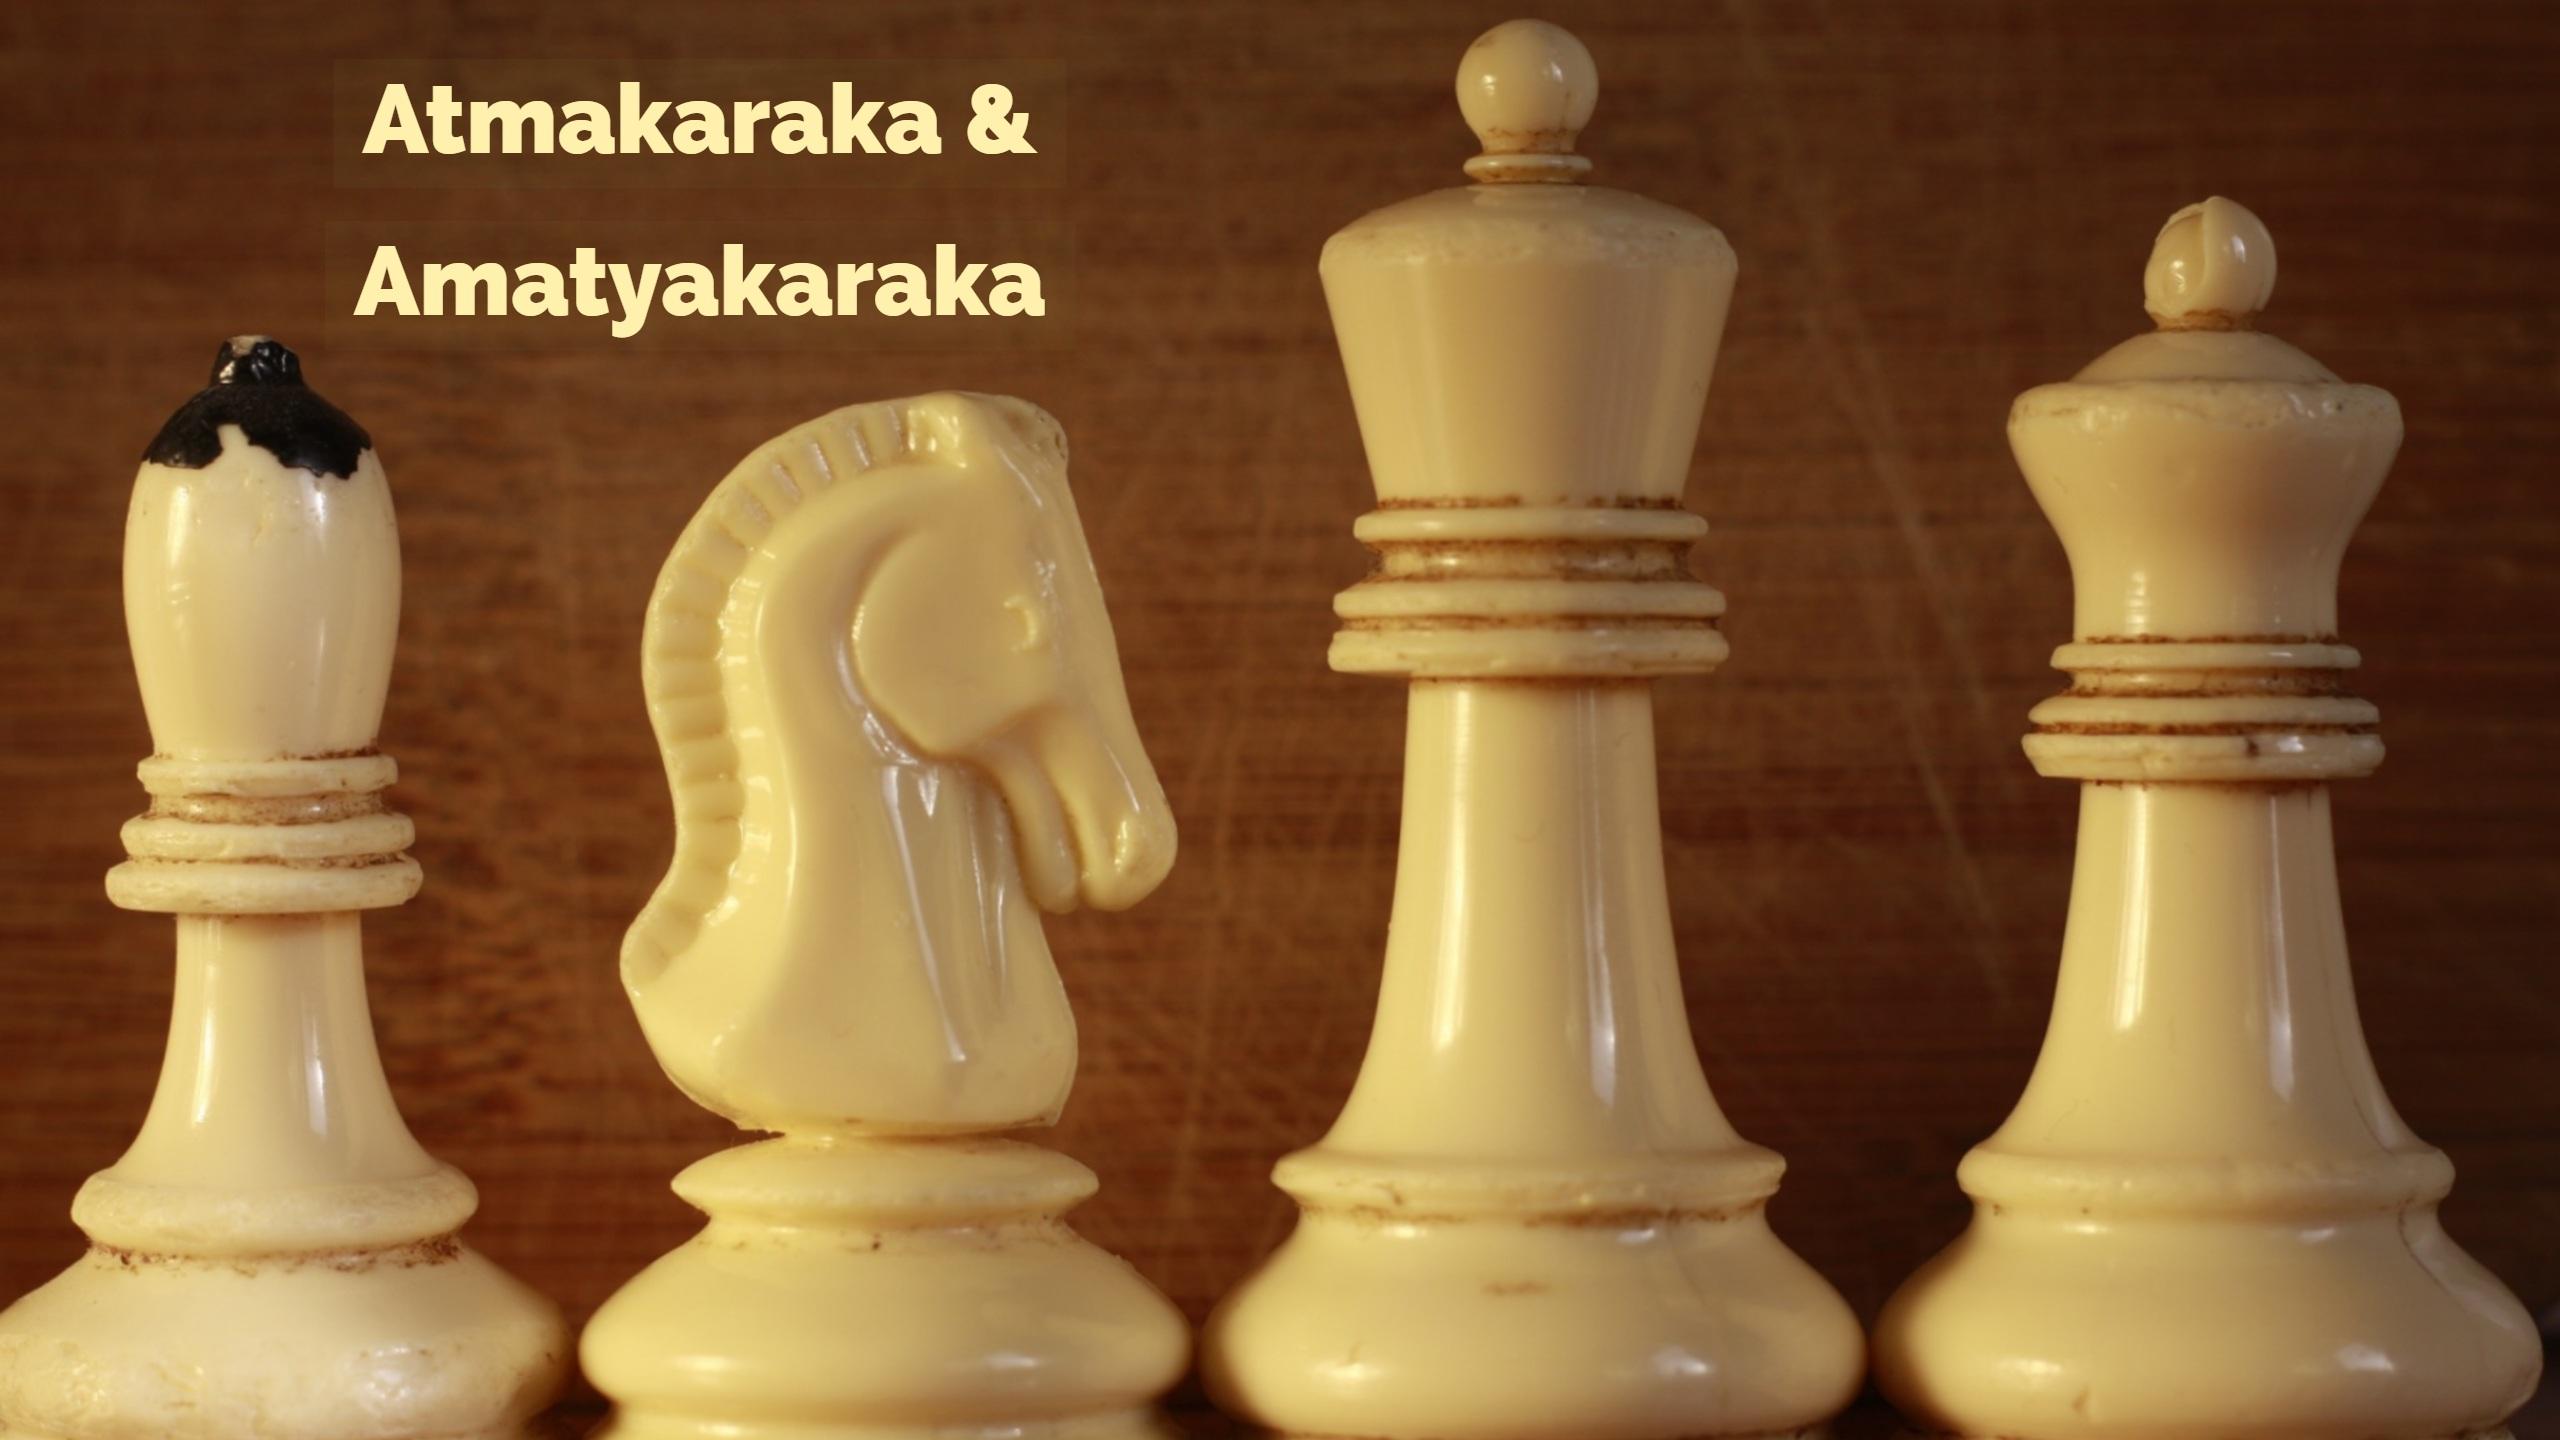 Atmakaraka & Amatyakaraka